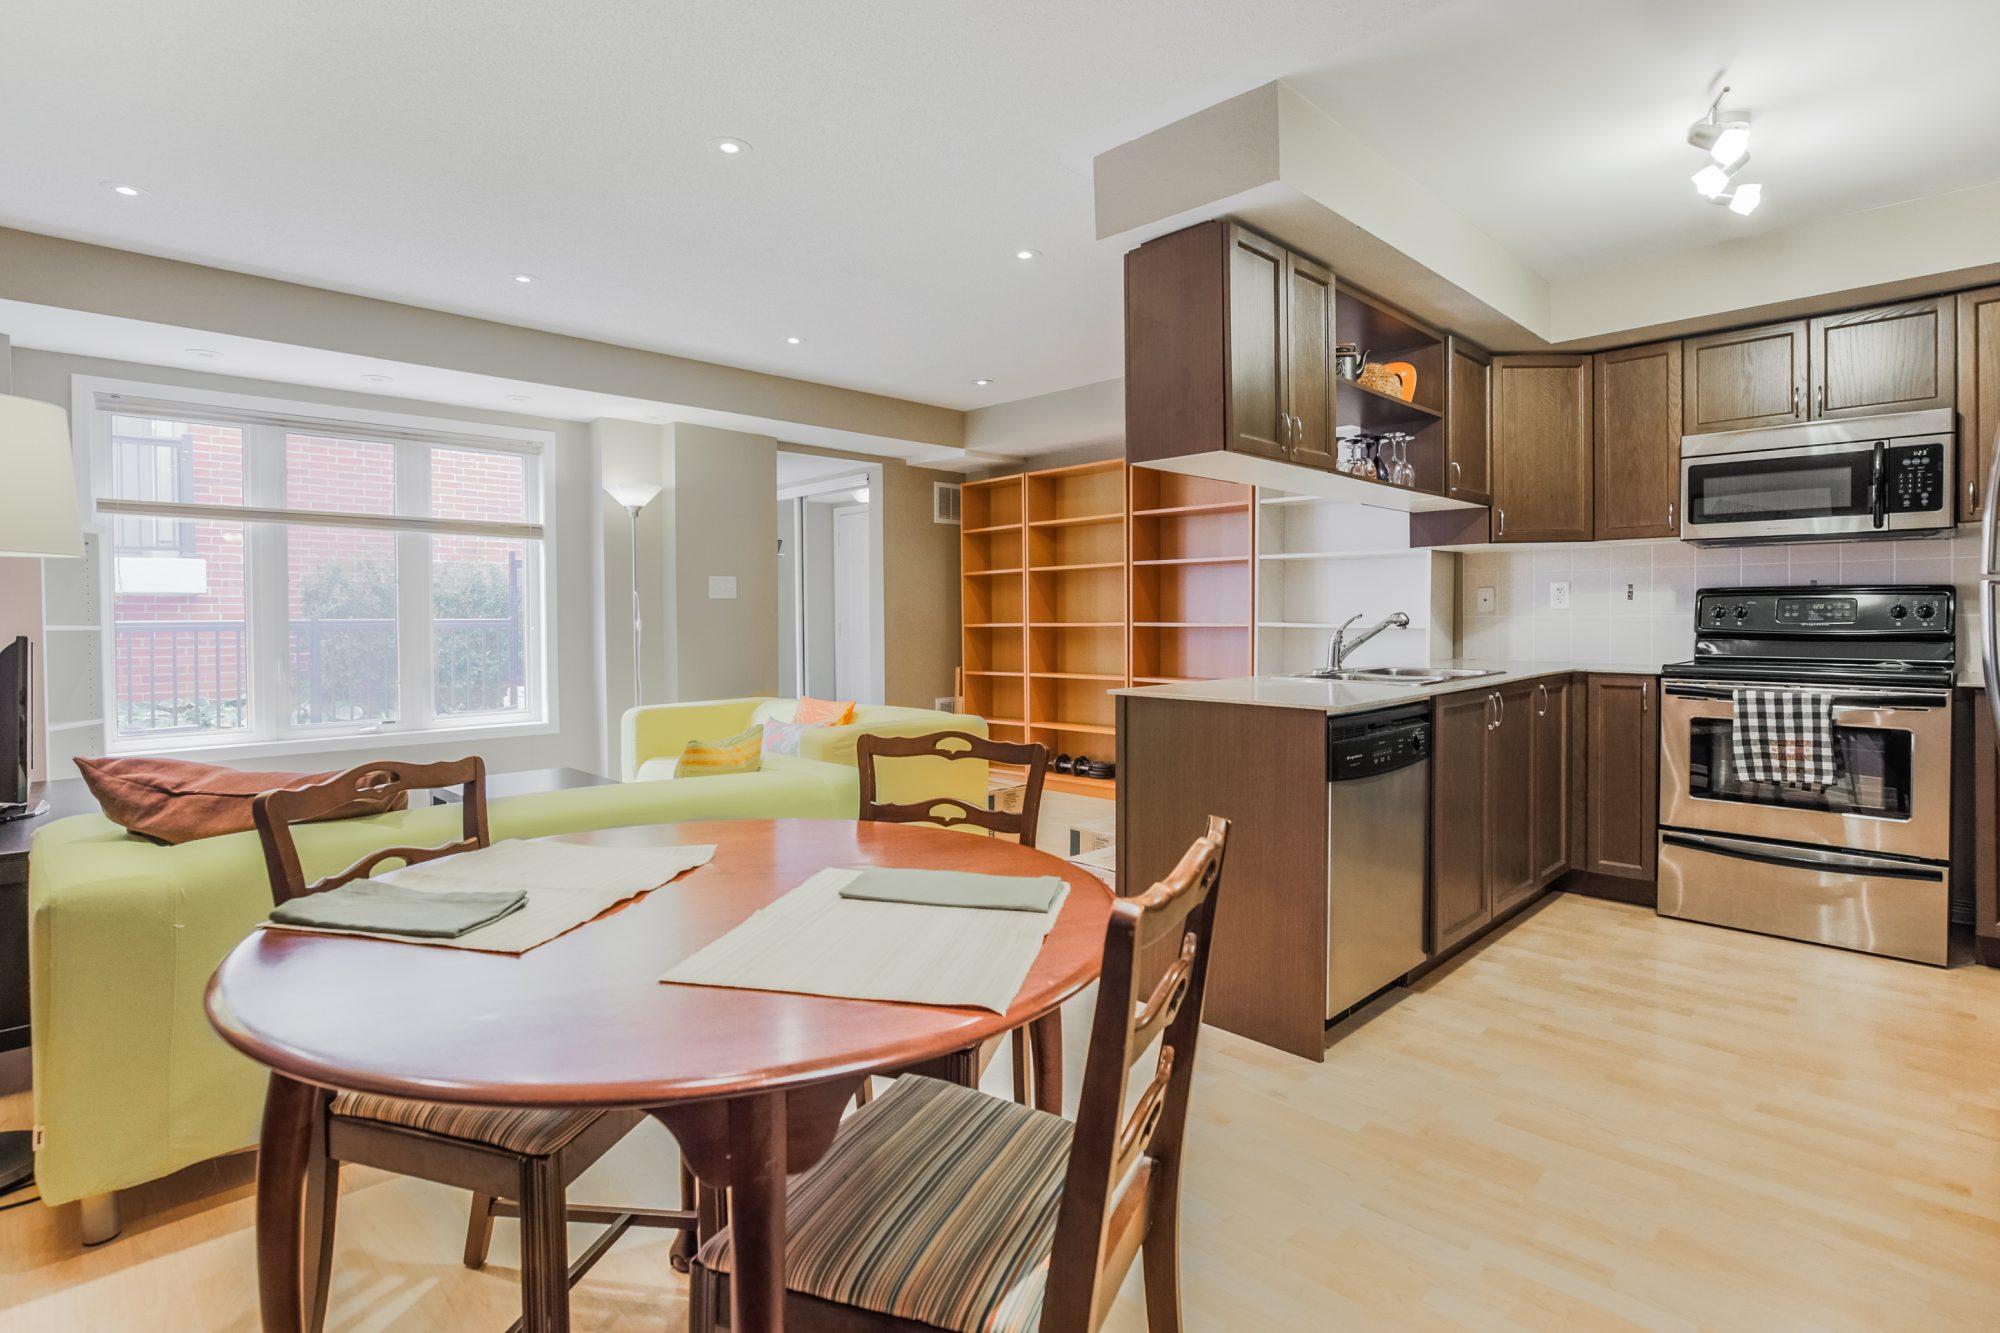 toronto-house-for-rent-8-kay-macpherson-lane-3